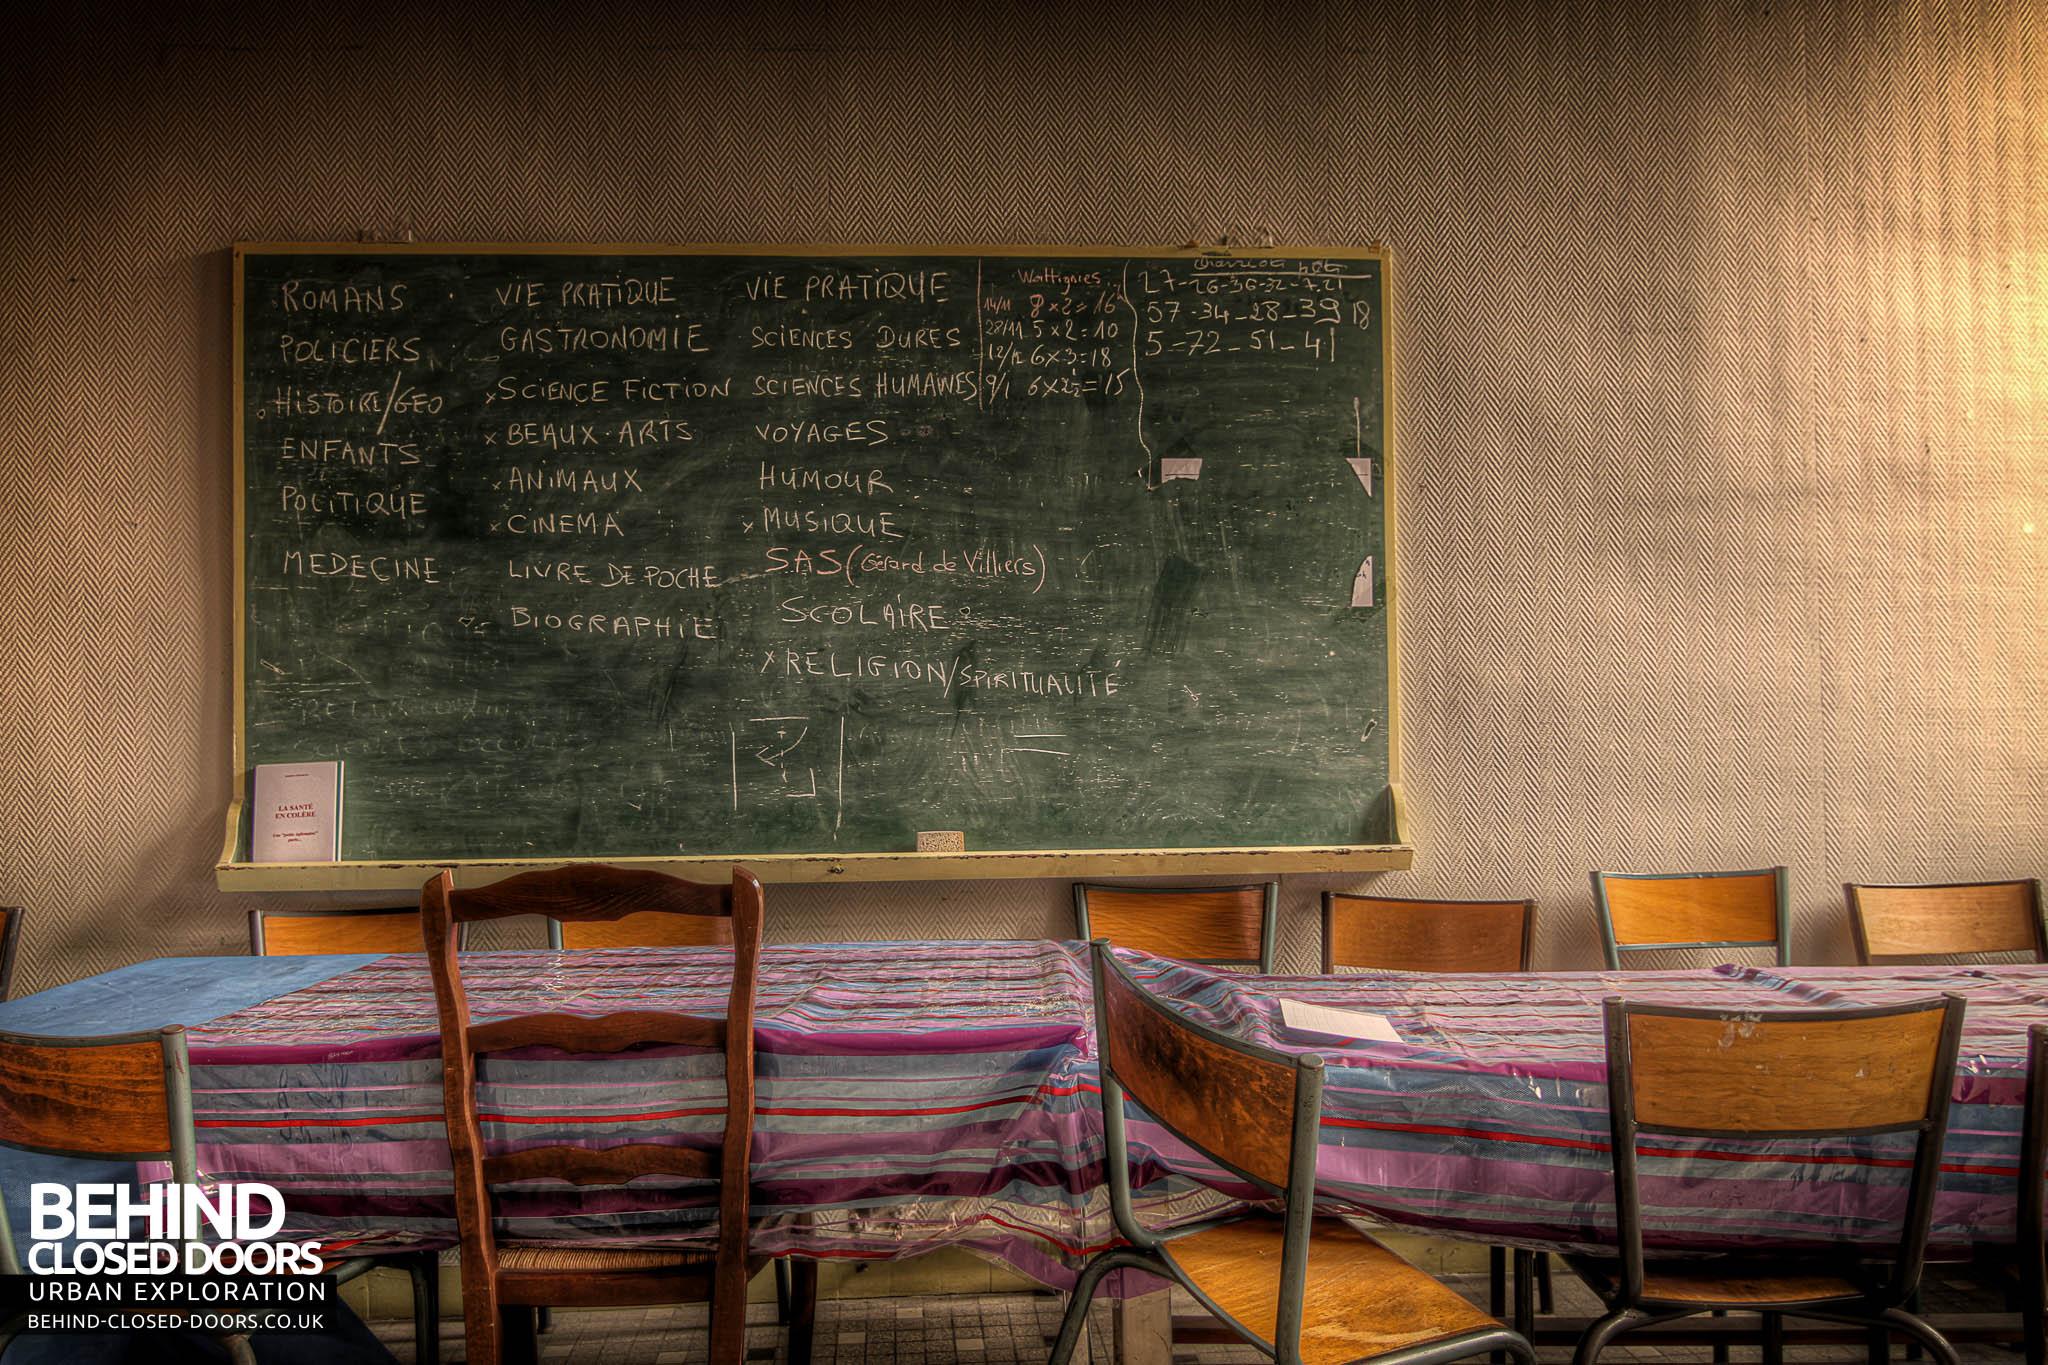 Blackboard Innovative Classroom ~ L école fmp school college france urbex behind